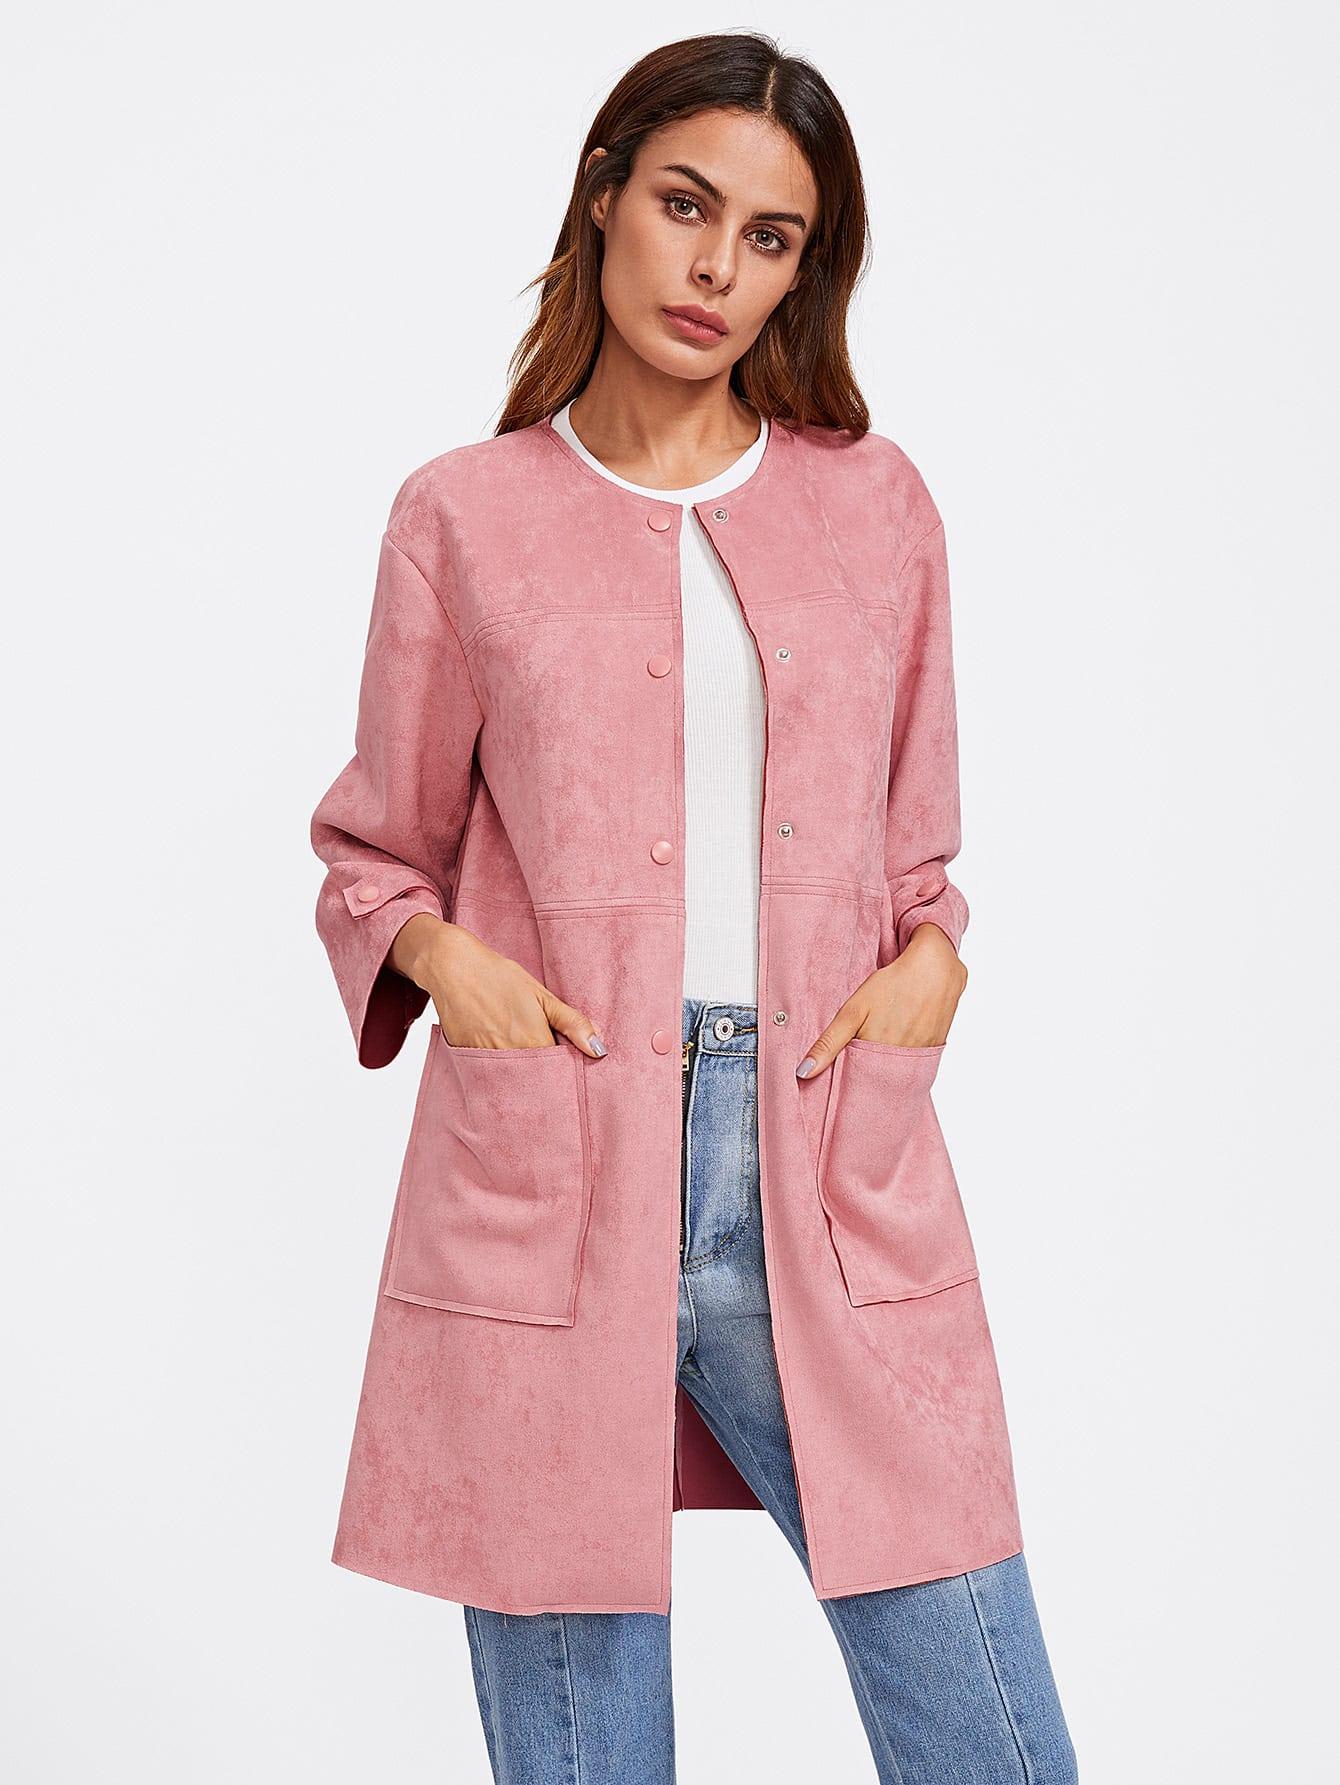 Patch Pocket Front Suede Coat